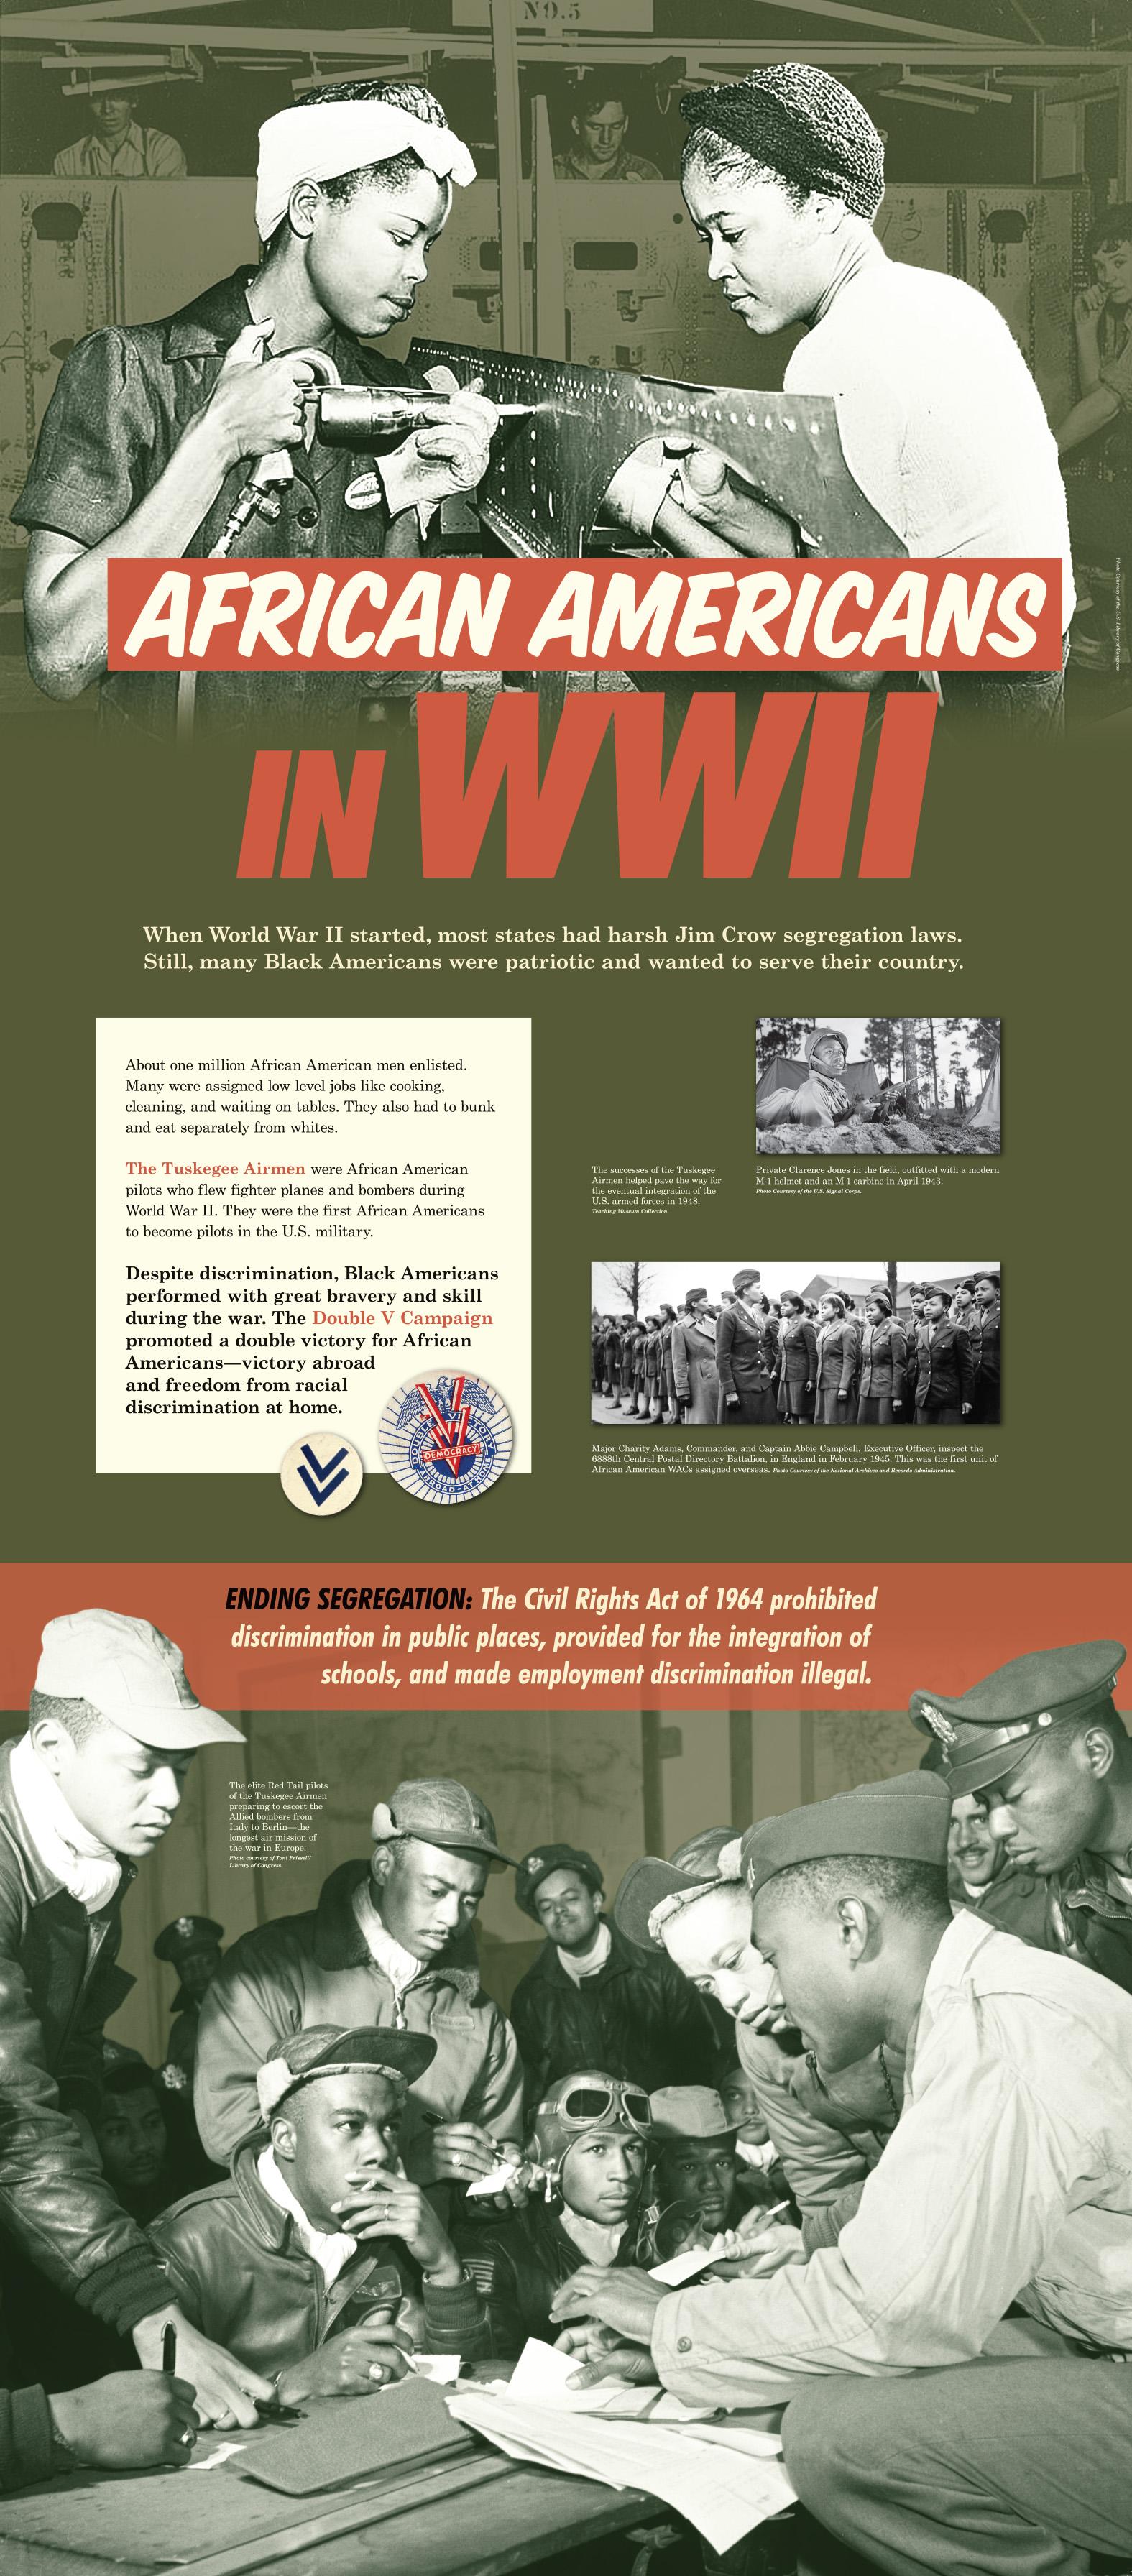 WWII-exhibit_b7R_AfricanAmericans.jpg